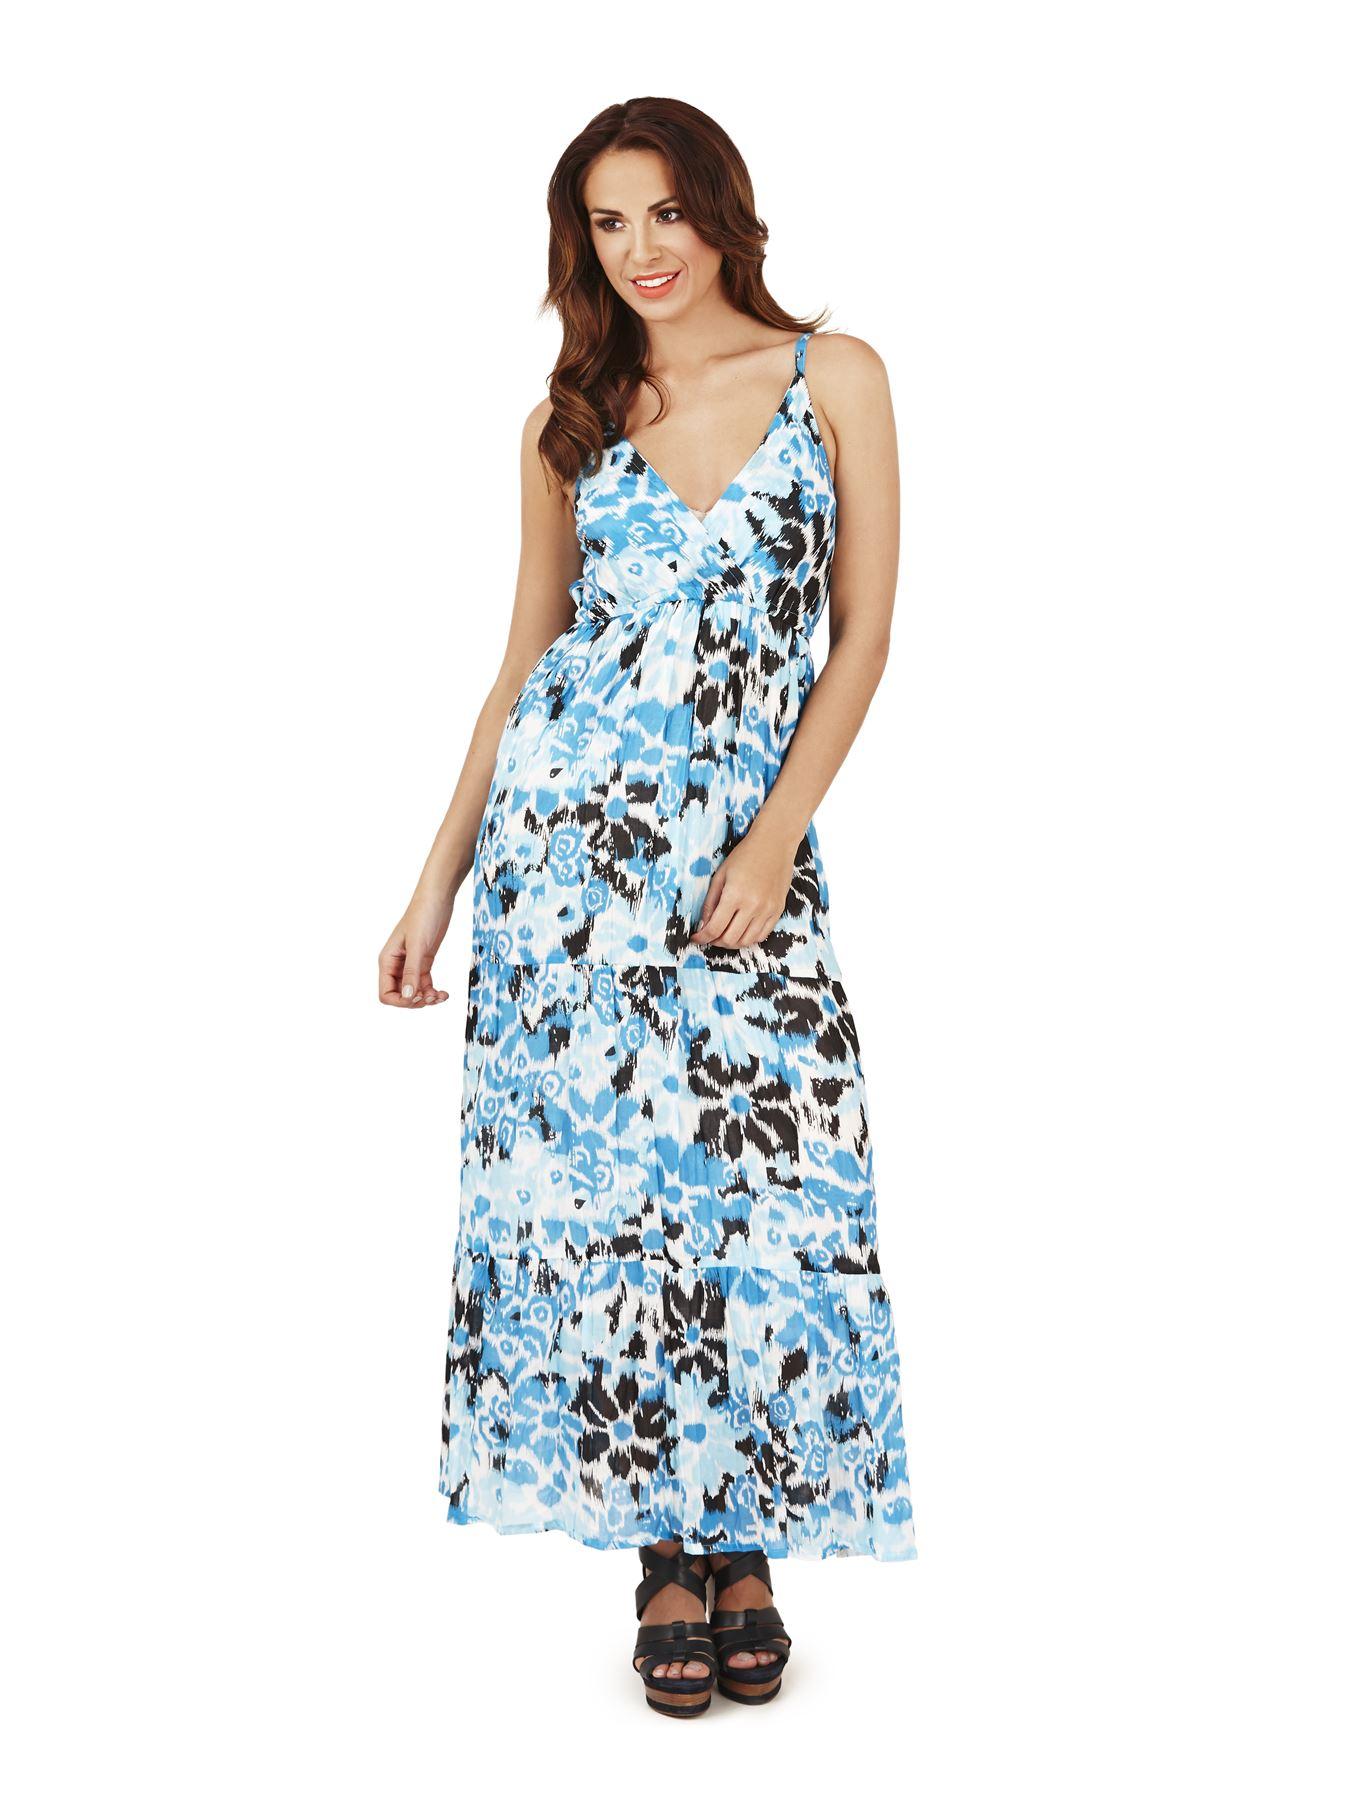 Bluelans Women's Sexy Sleeveless Round Neck Soft Cotton Summer Long Maxi Vest Dress. Sold by Bluelans. $ jelly555.ml Loose Sleeveless O Neck Dress Cotton Linen Long Maxi Dress. Sold by VIRTUAL STORE USA. $ jelly555.ml Women's Kimono Beachwear Swimwear Swimsuit Batik COTTON Long Kaftan Dress MAXI.